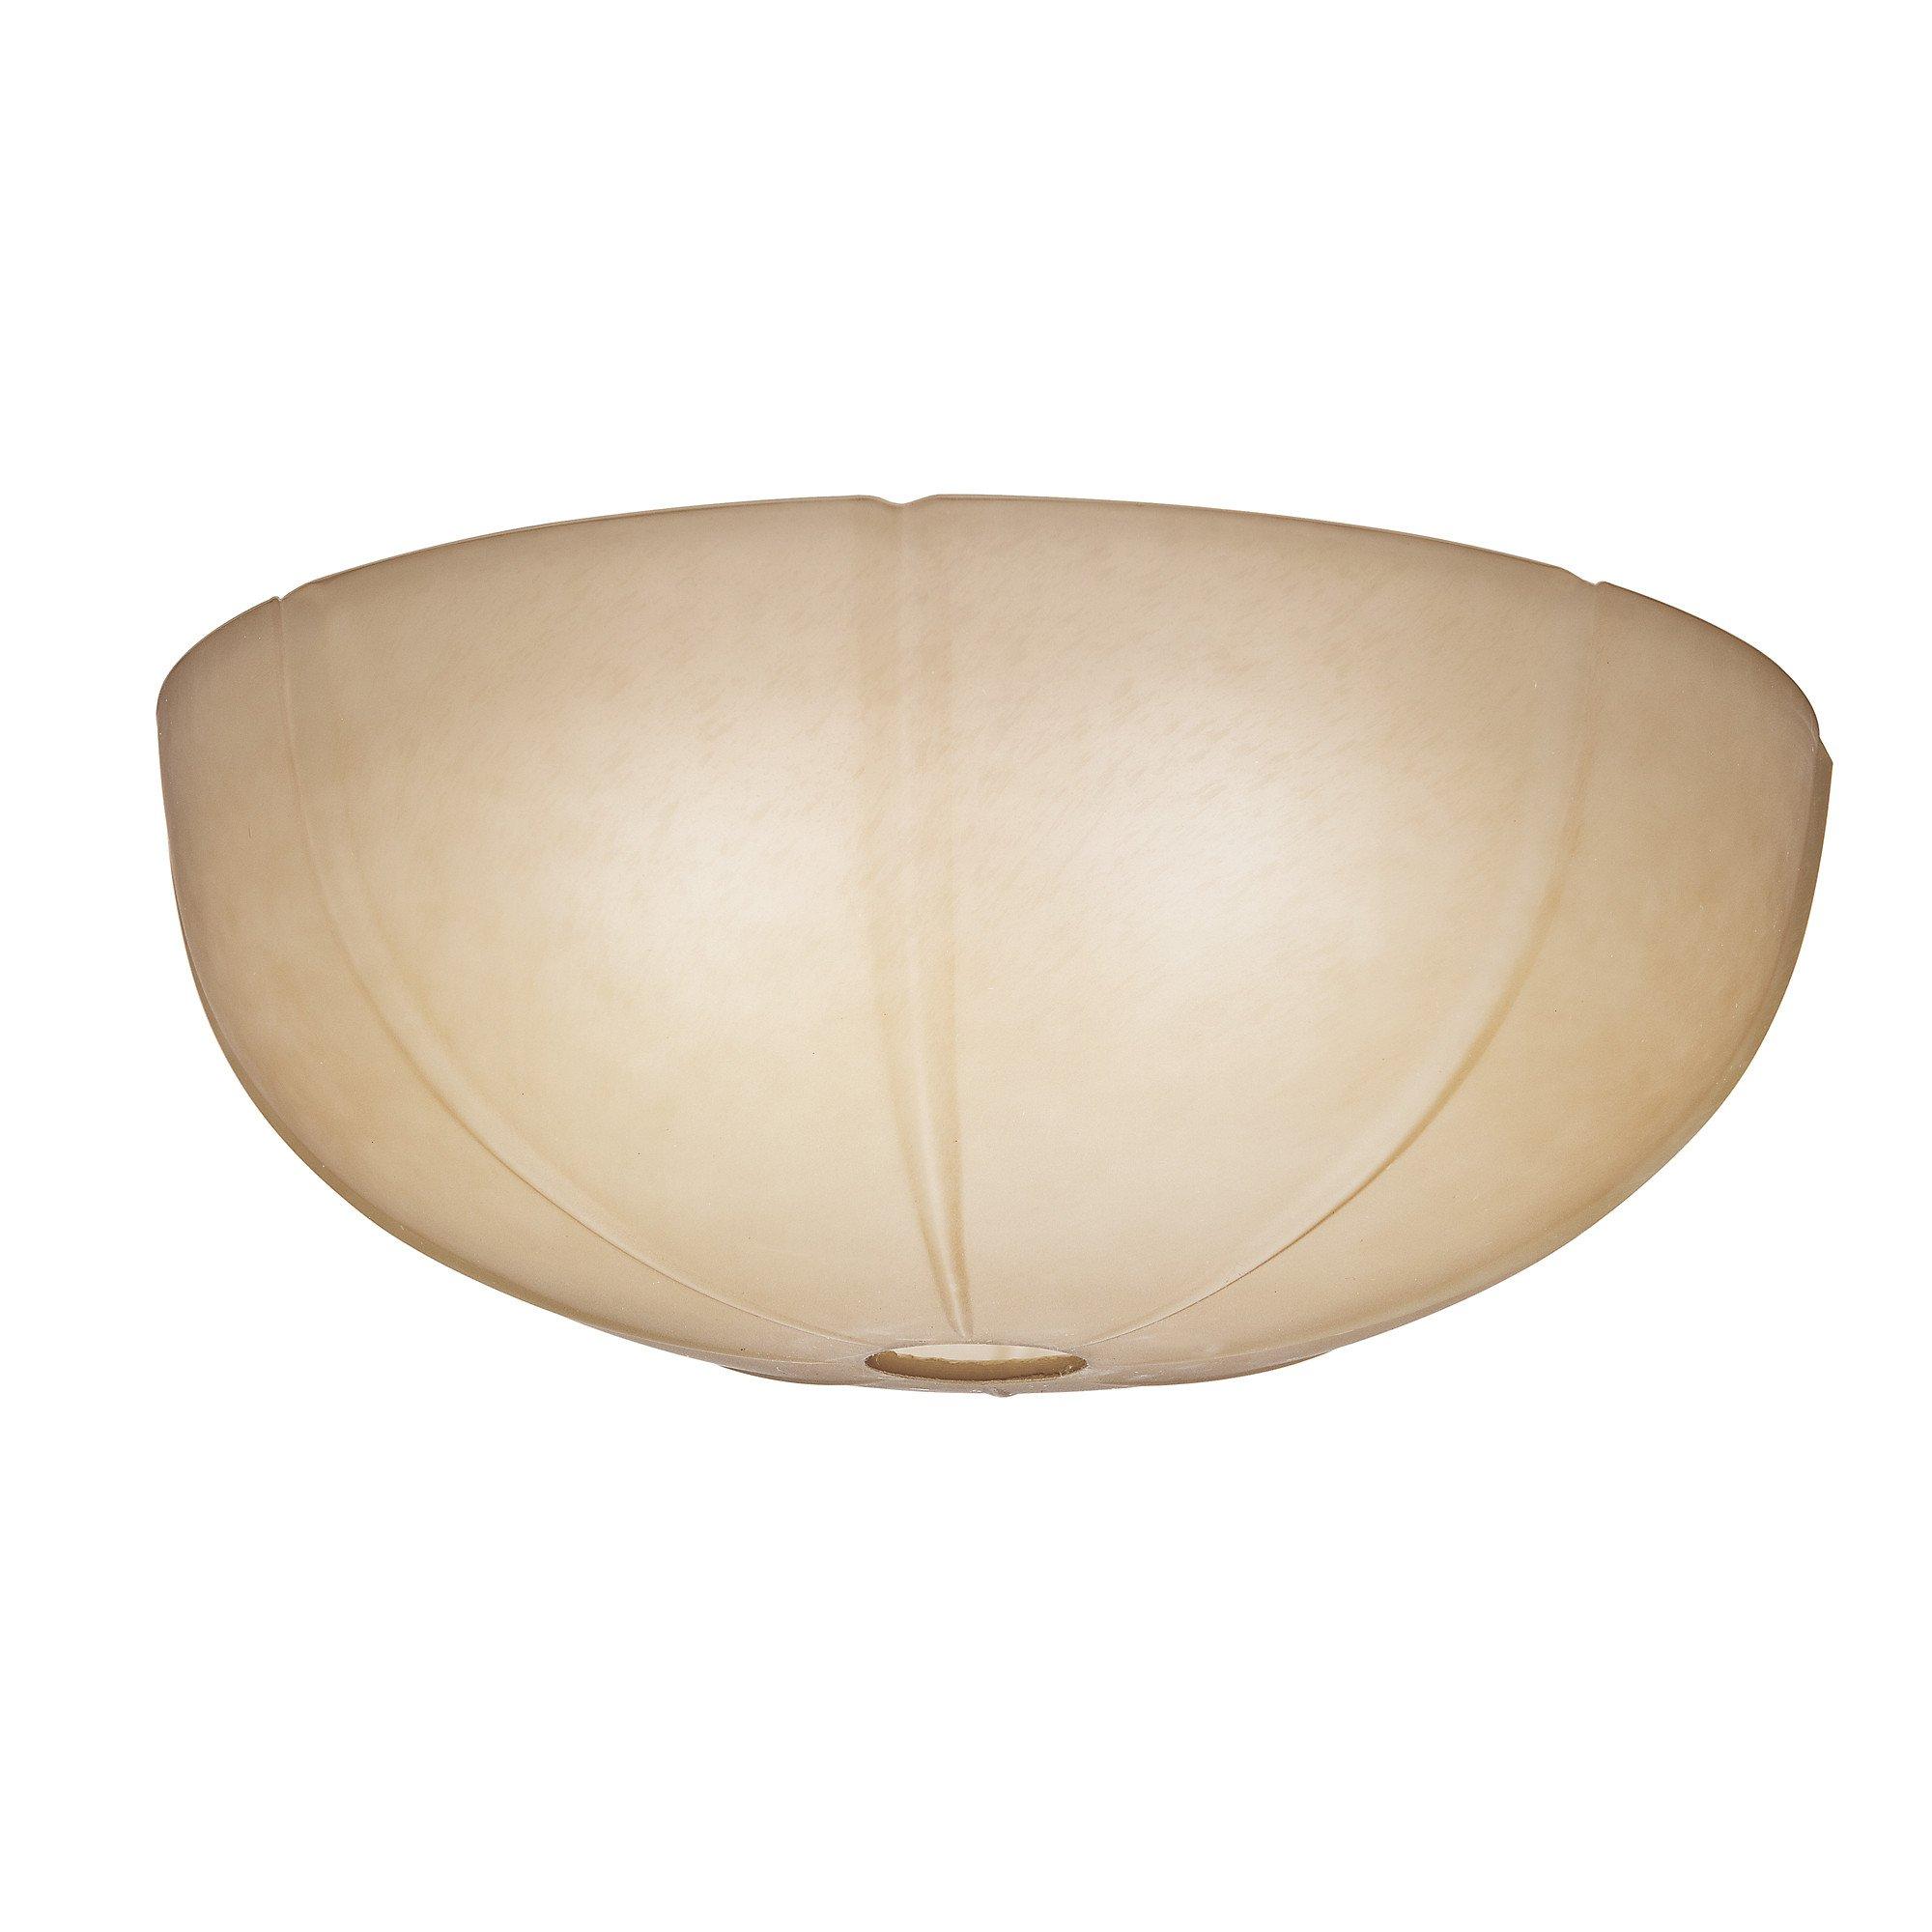 Casablanca Fan Company - 99062 - Tea Stain Glass Bowl